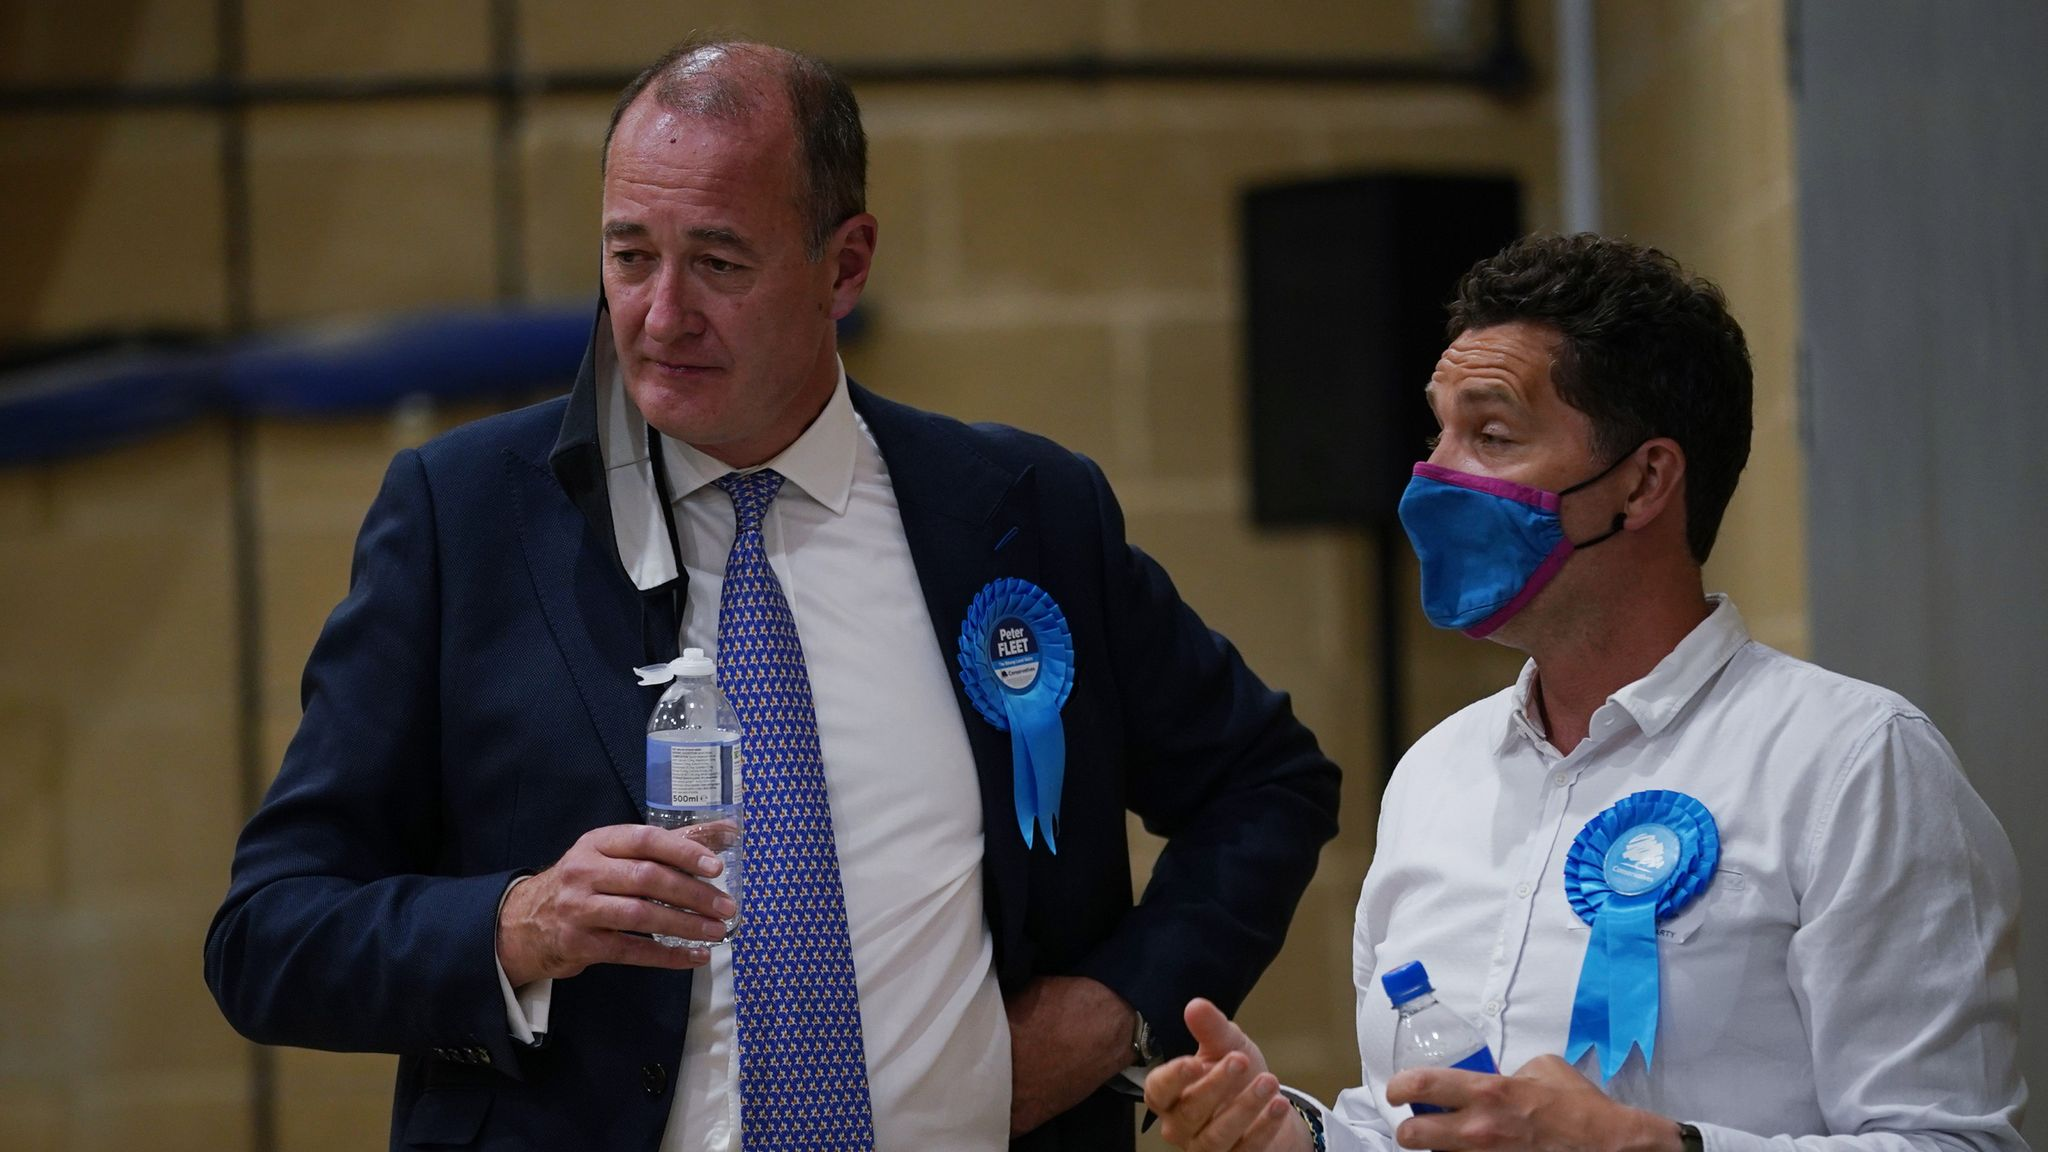 chesham and amersham by election - photo #3